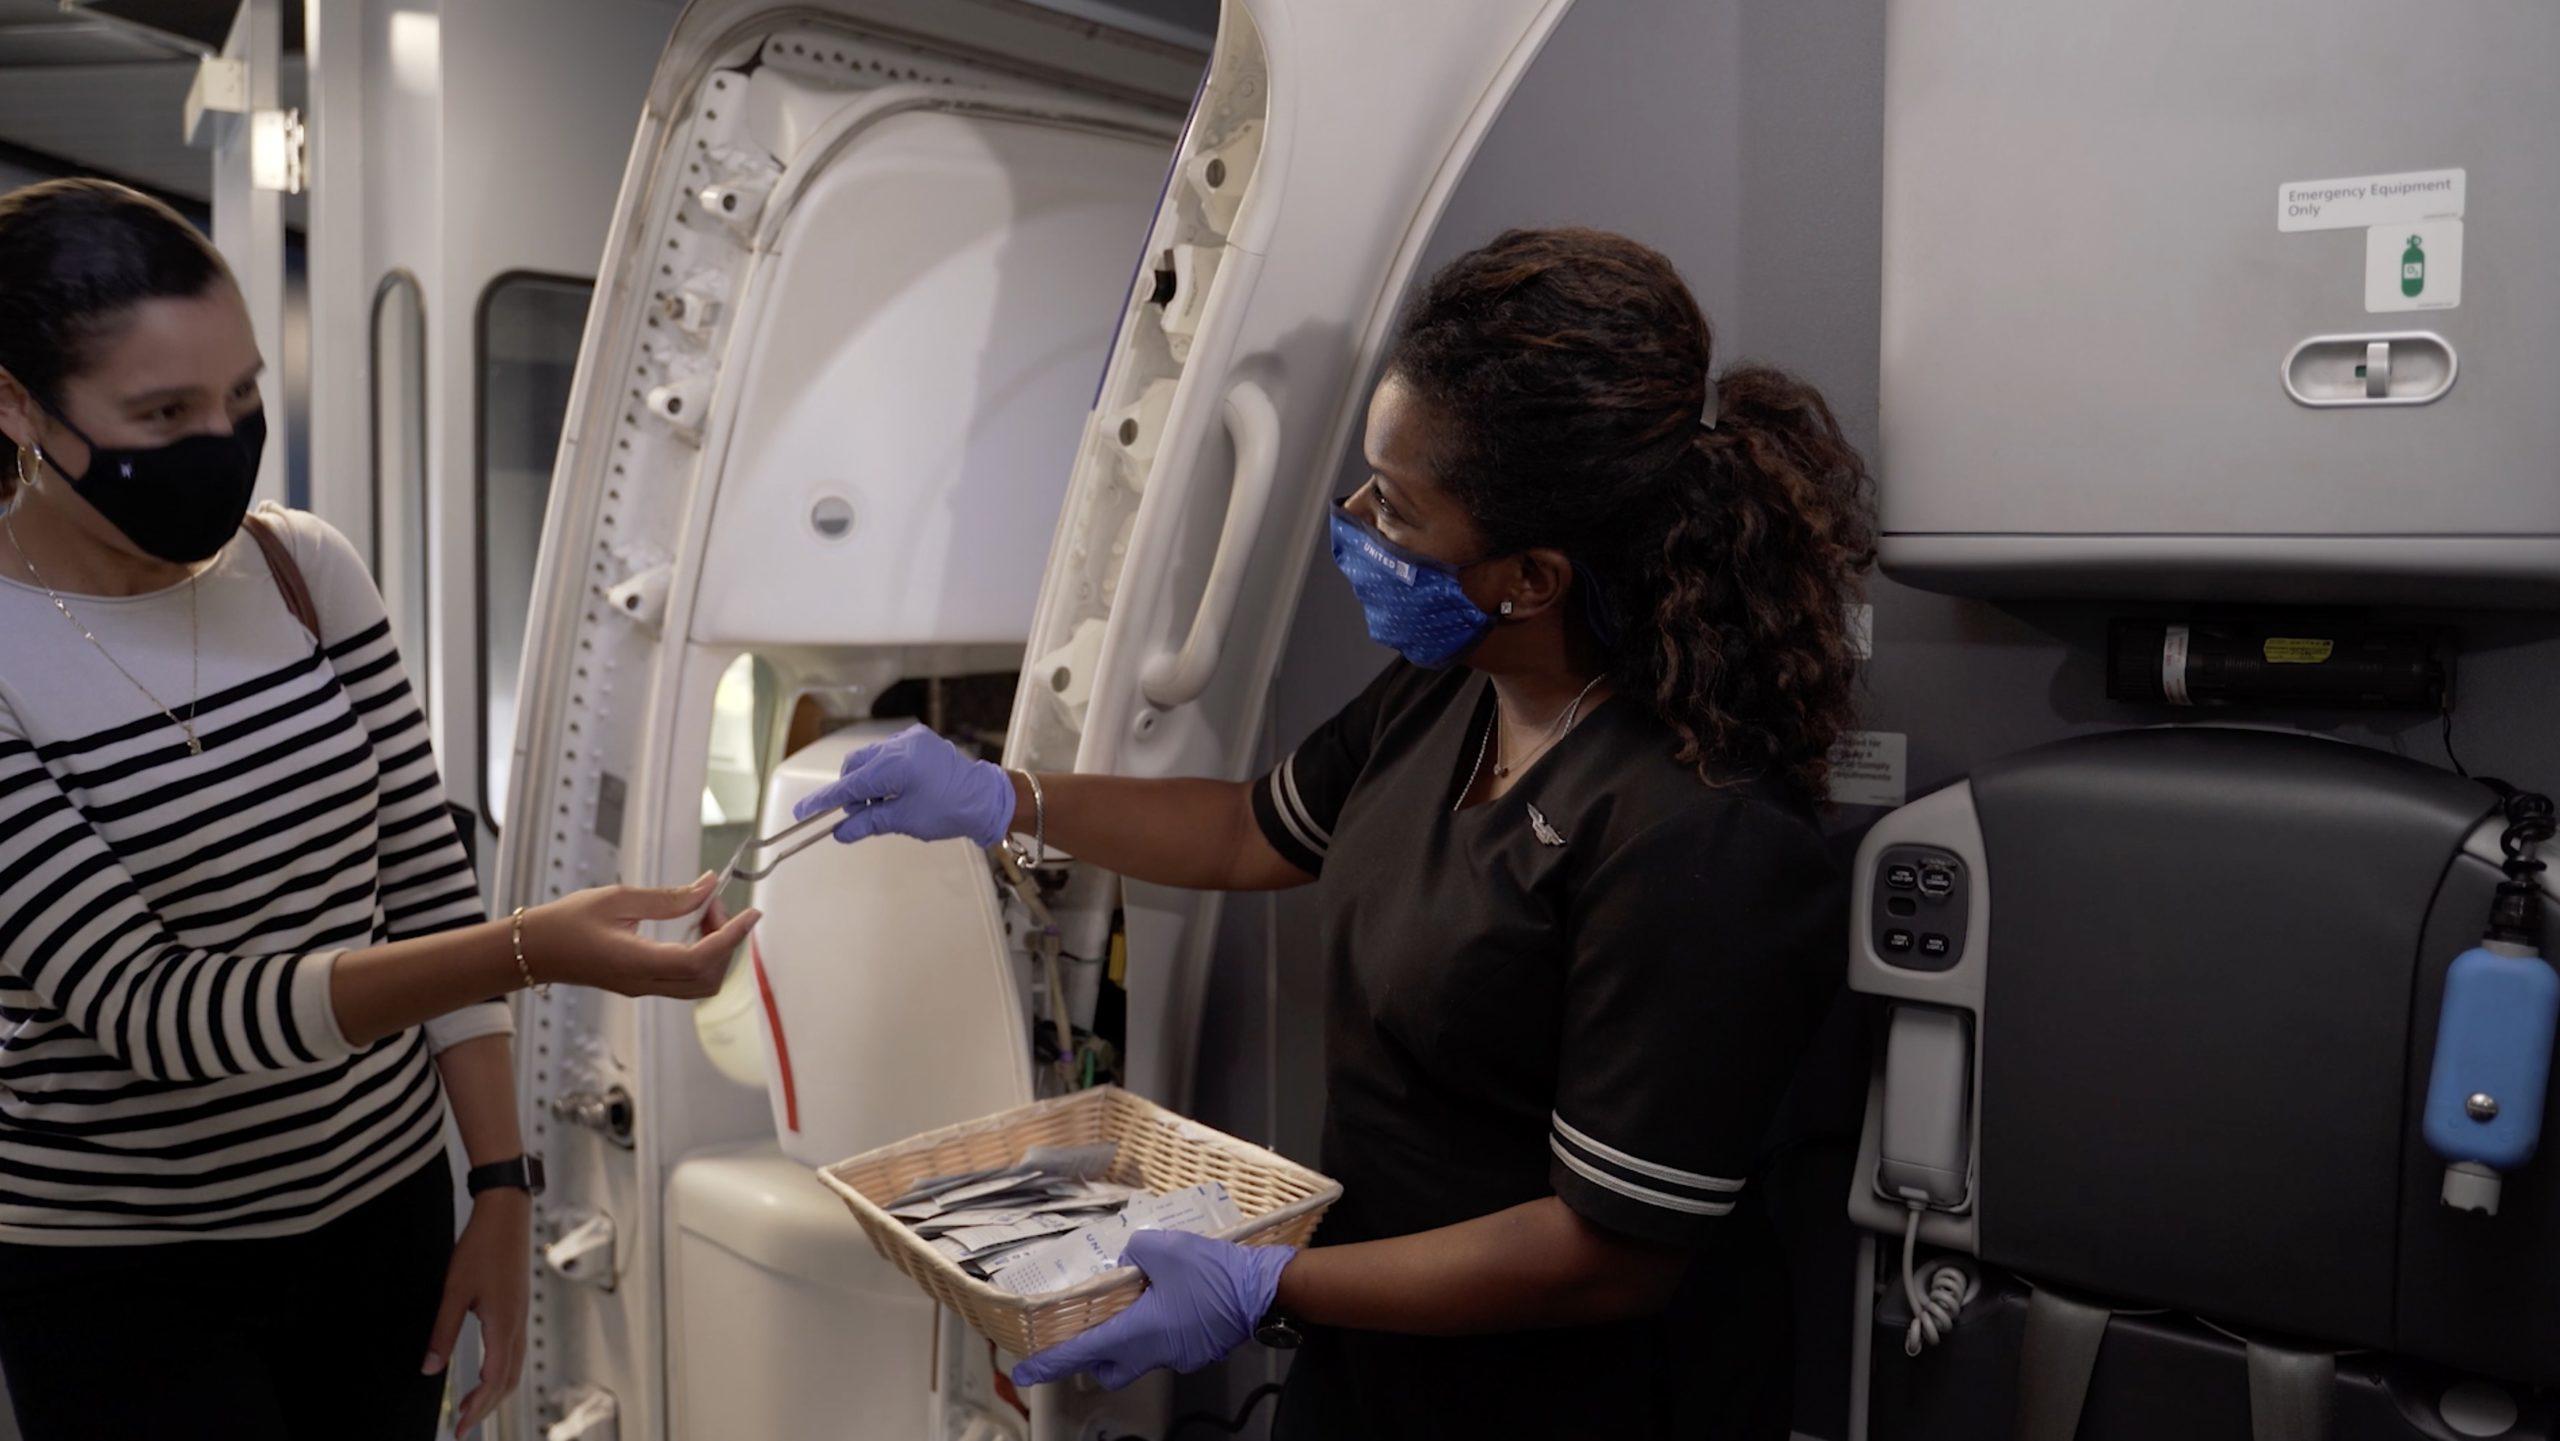 United Airlines Passenger Mask Ban